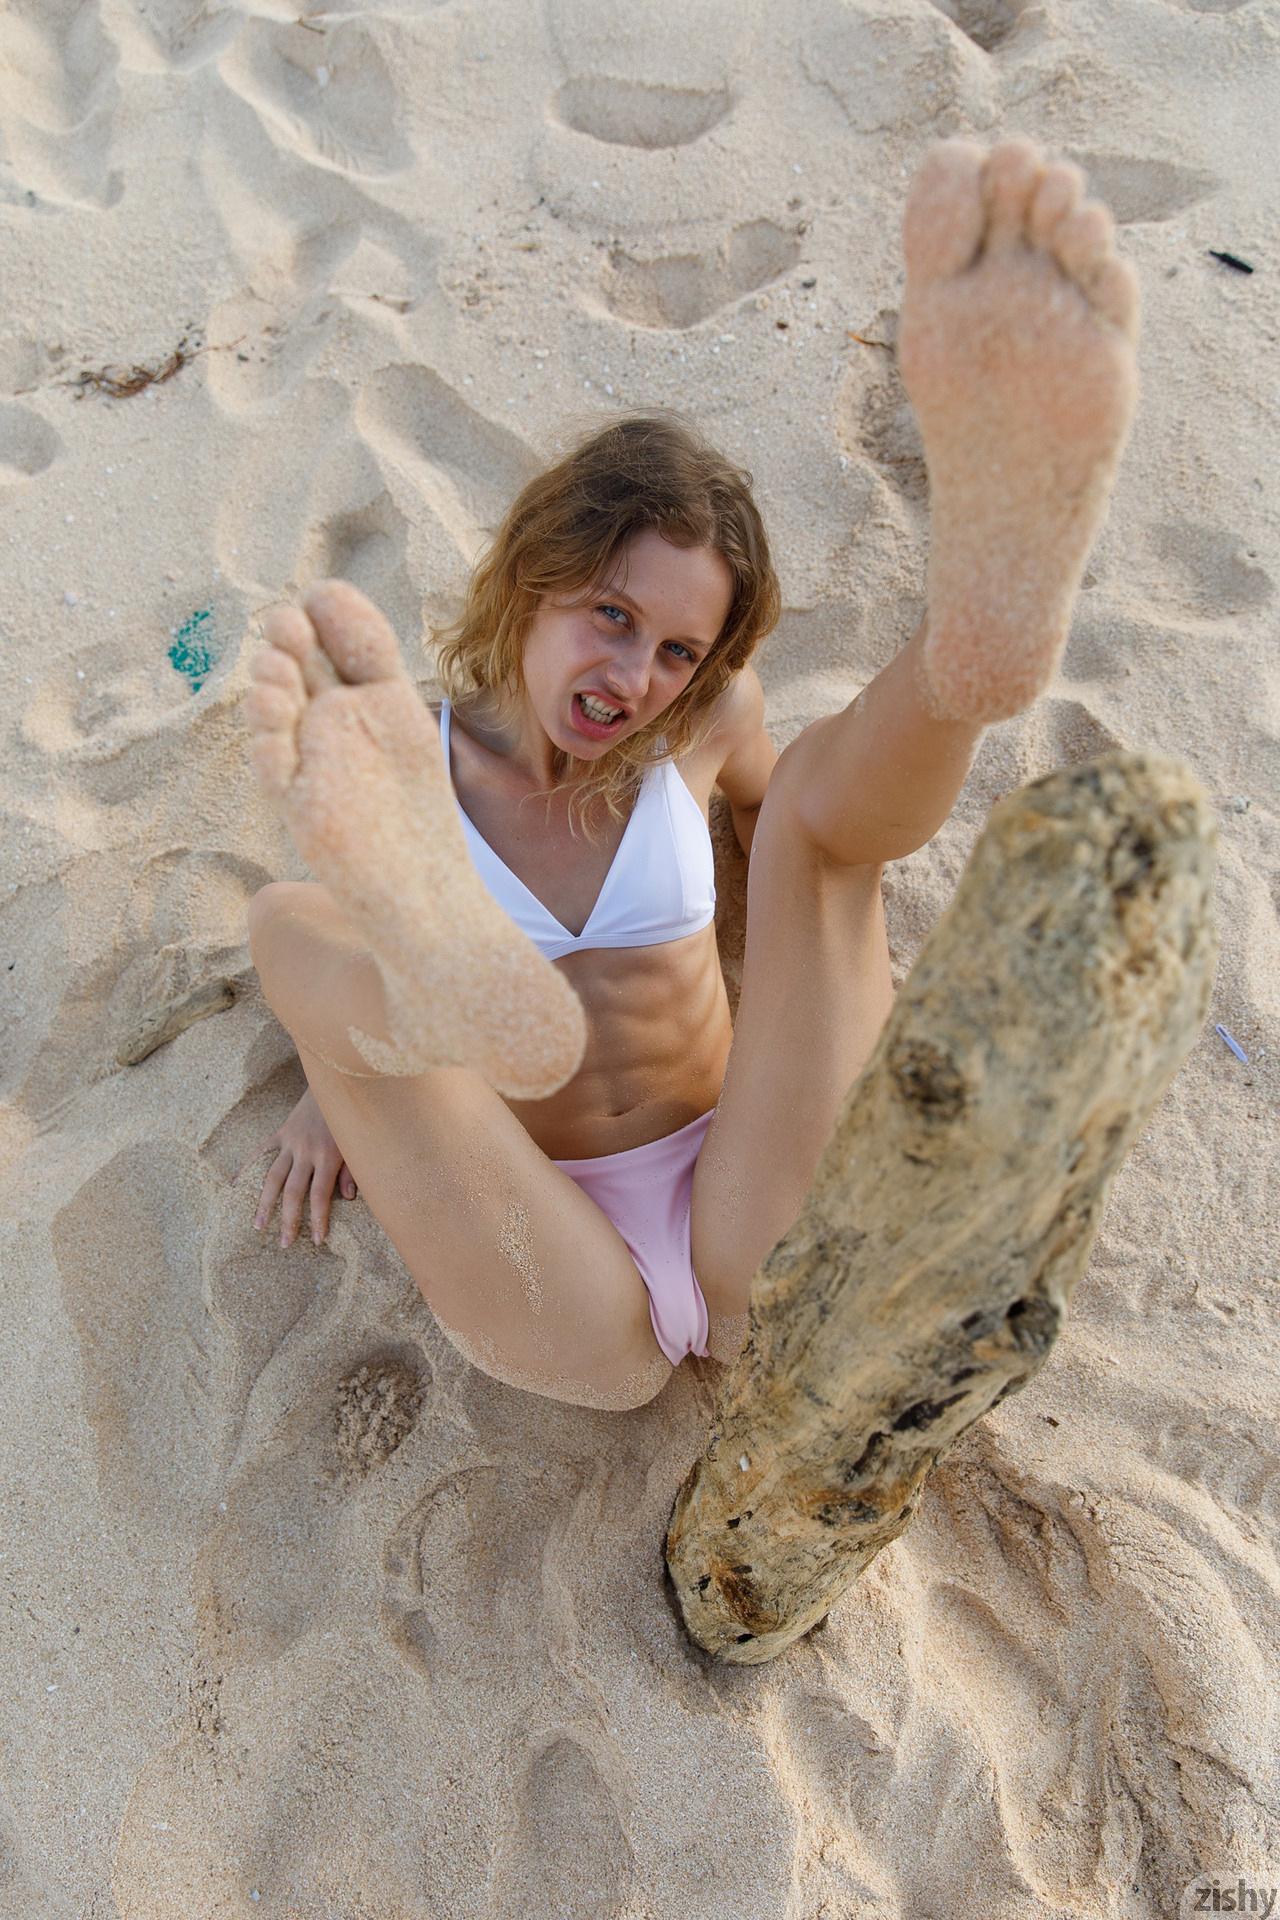 Sonia Clarice On Trashy Beach Zishy (12)